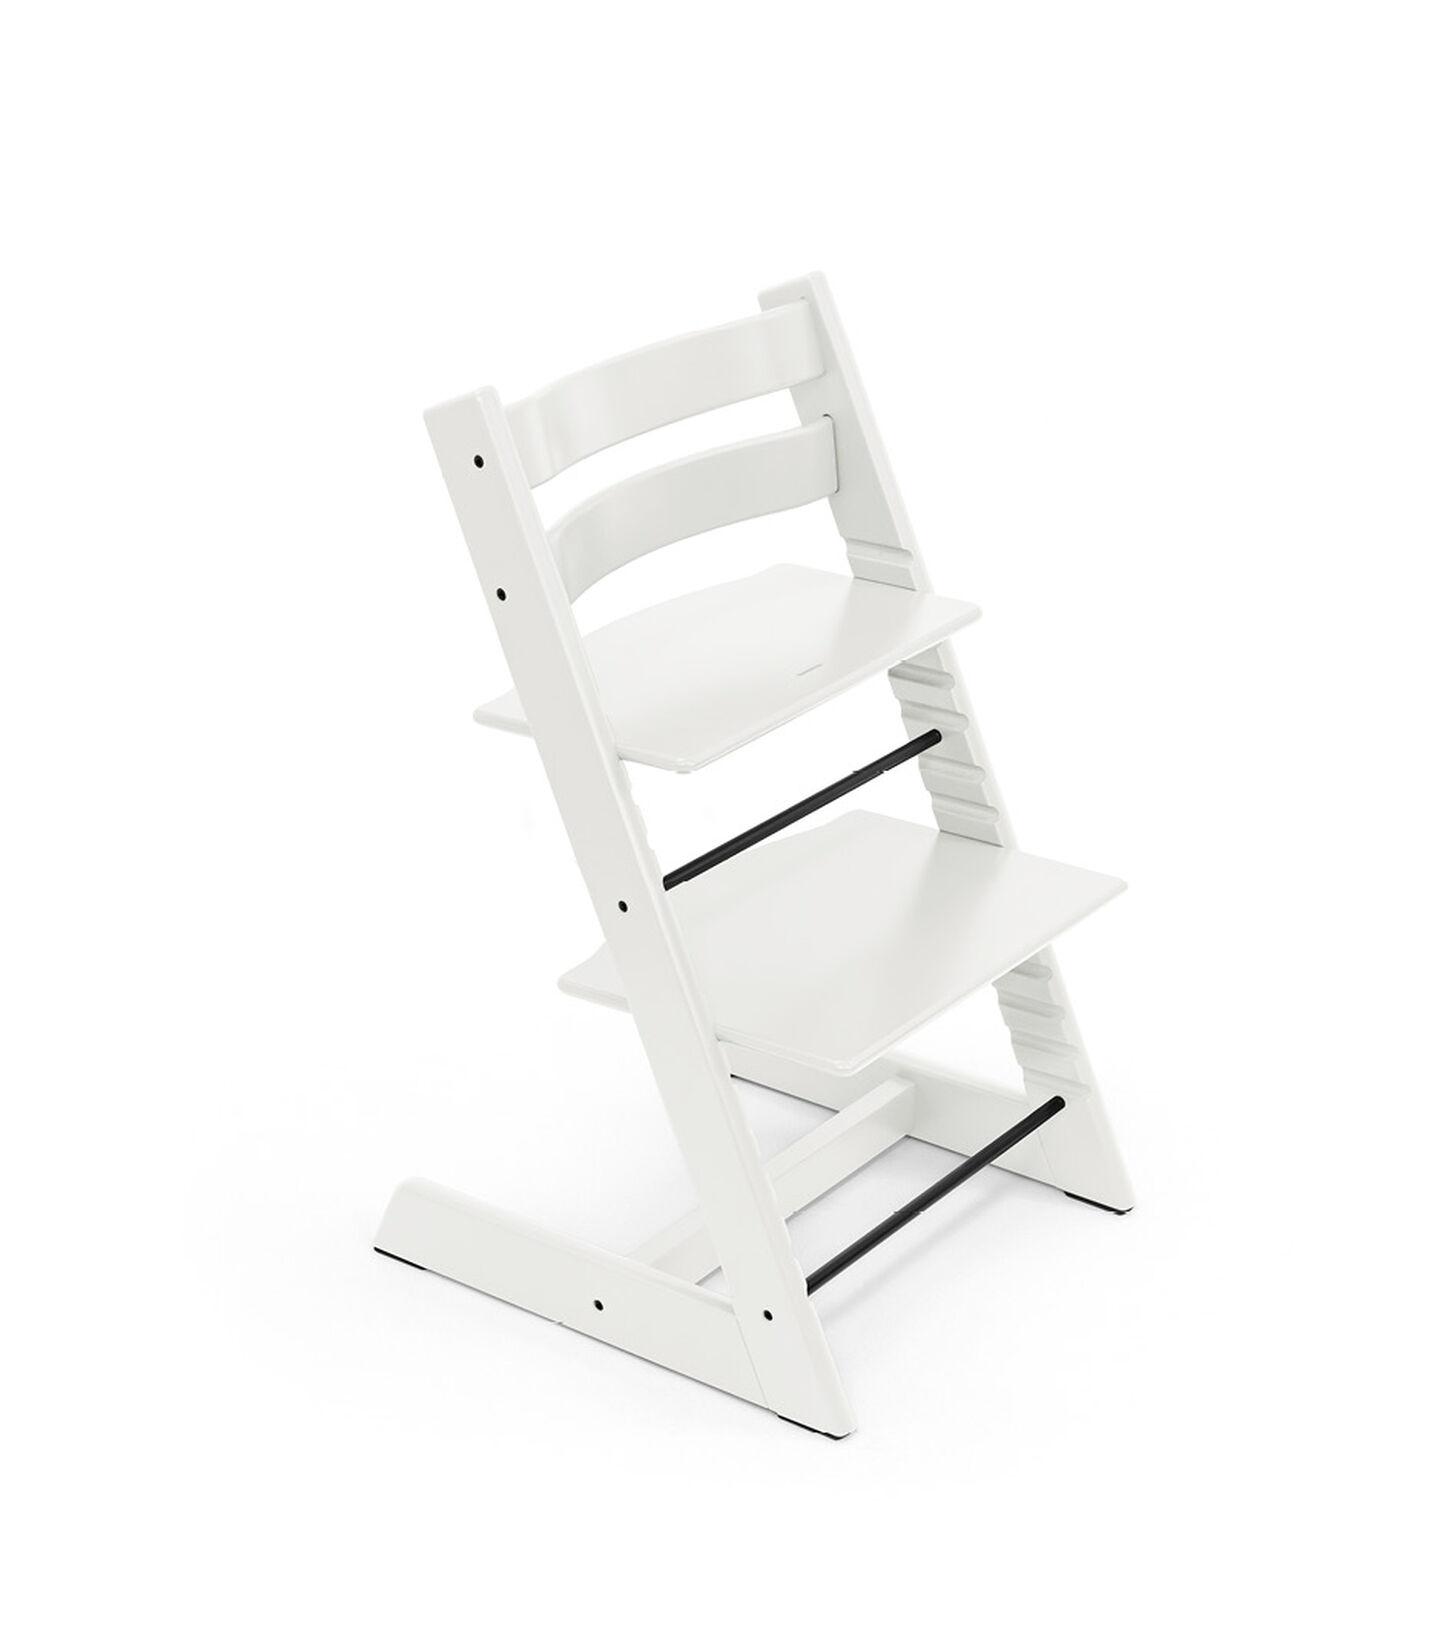 Krzesło Tripp Trapp® White, White, mainview view 1